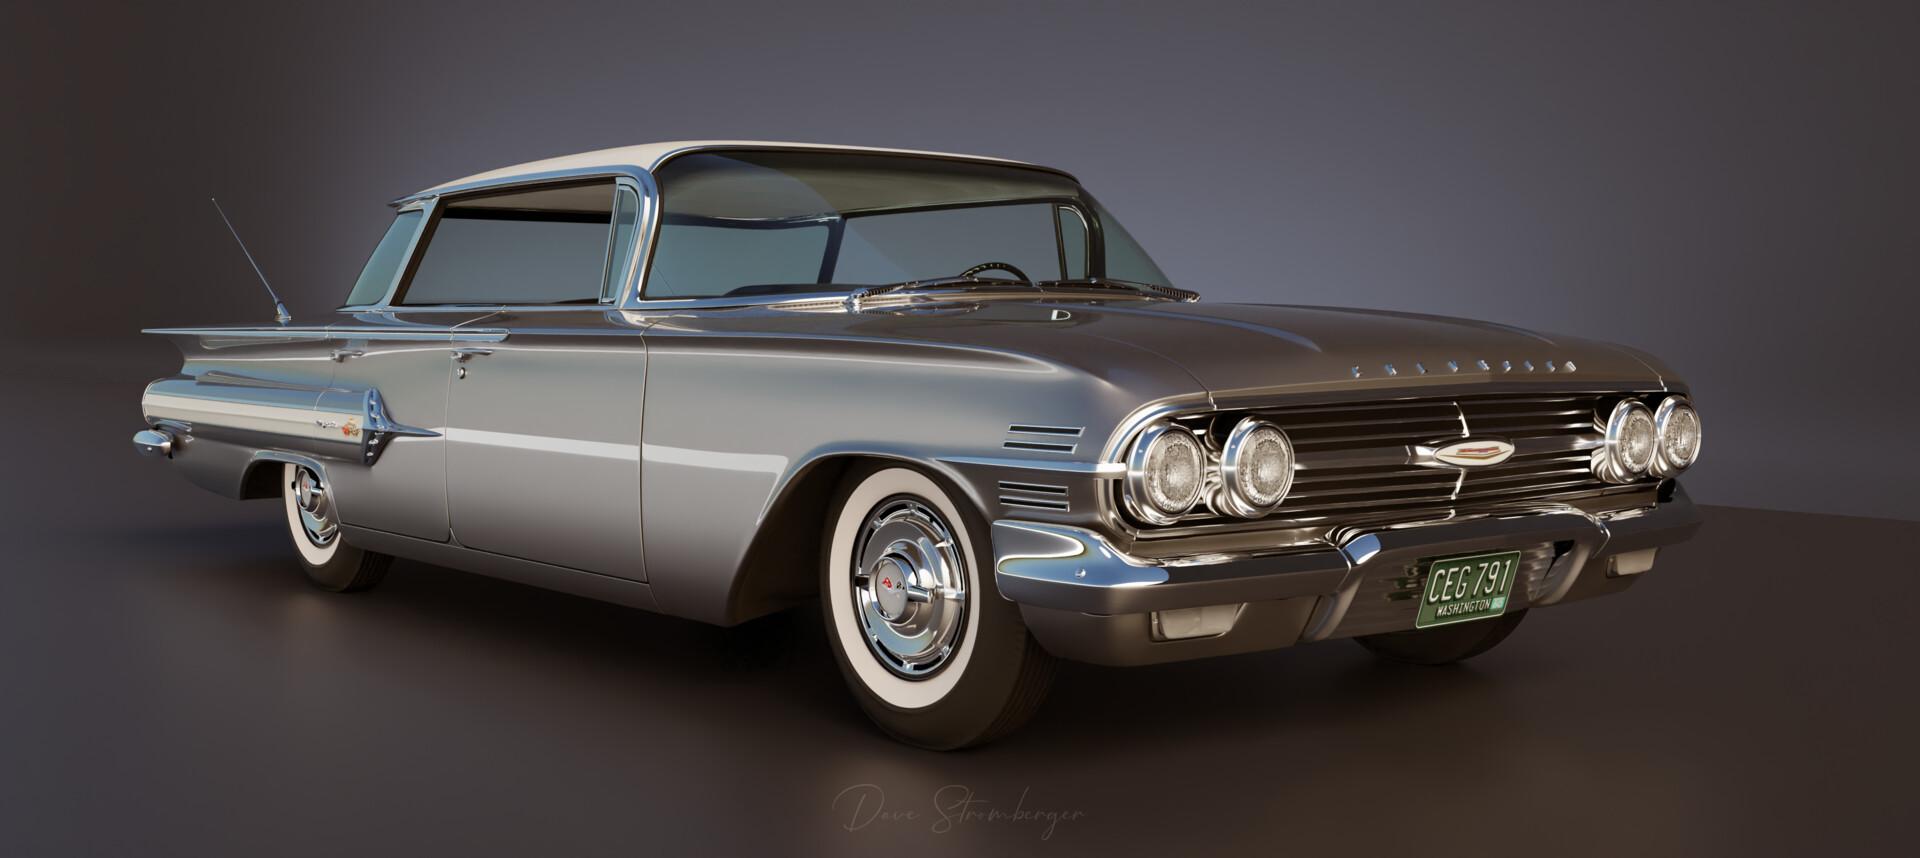 Dave Stromberger 1960 Chevrolet Impala Sport Sedan Silver